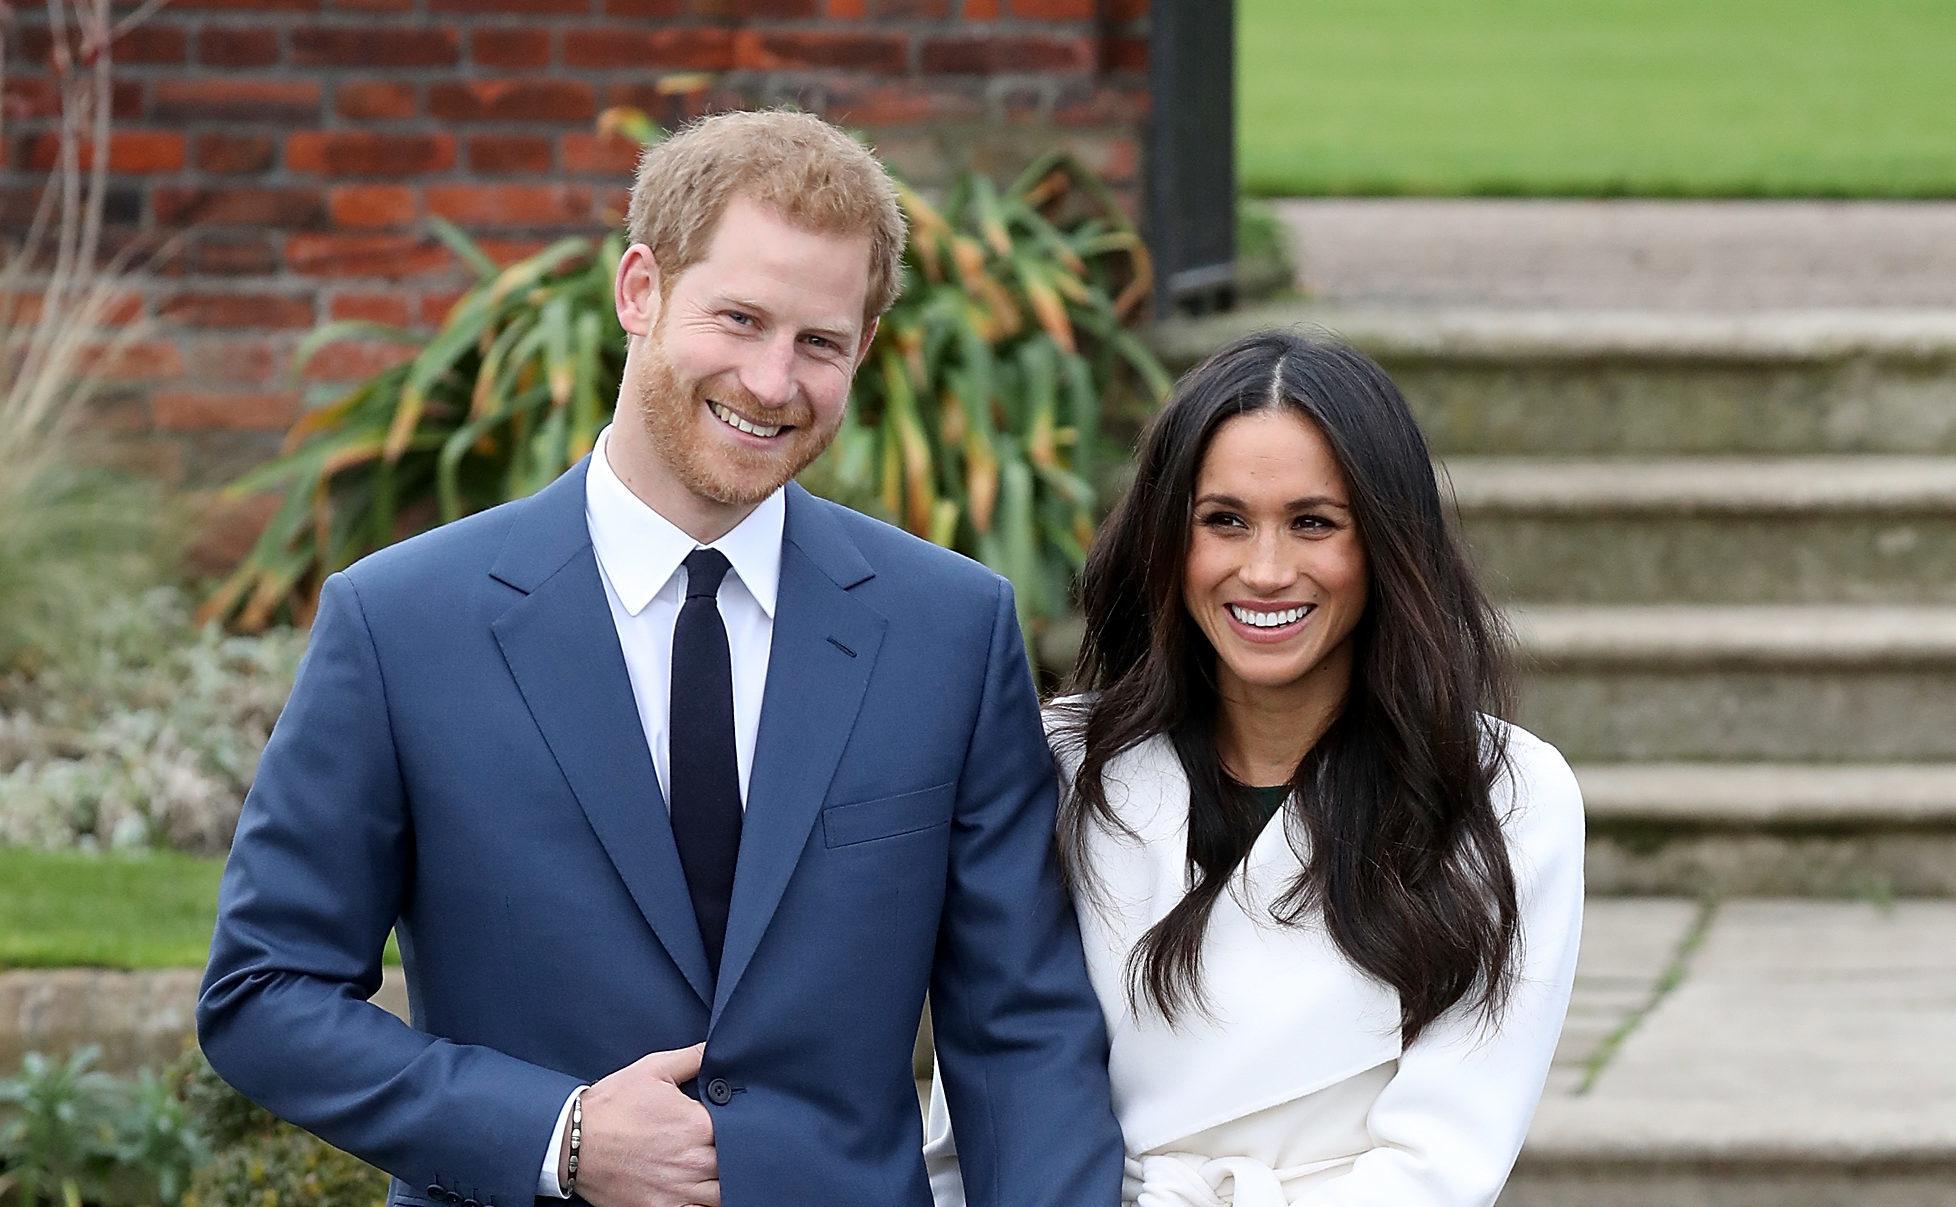 Prince Harry and Meghan Markle (Chris Jackson/Chris Jackson/Getty Images)